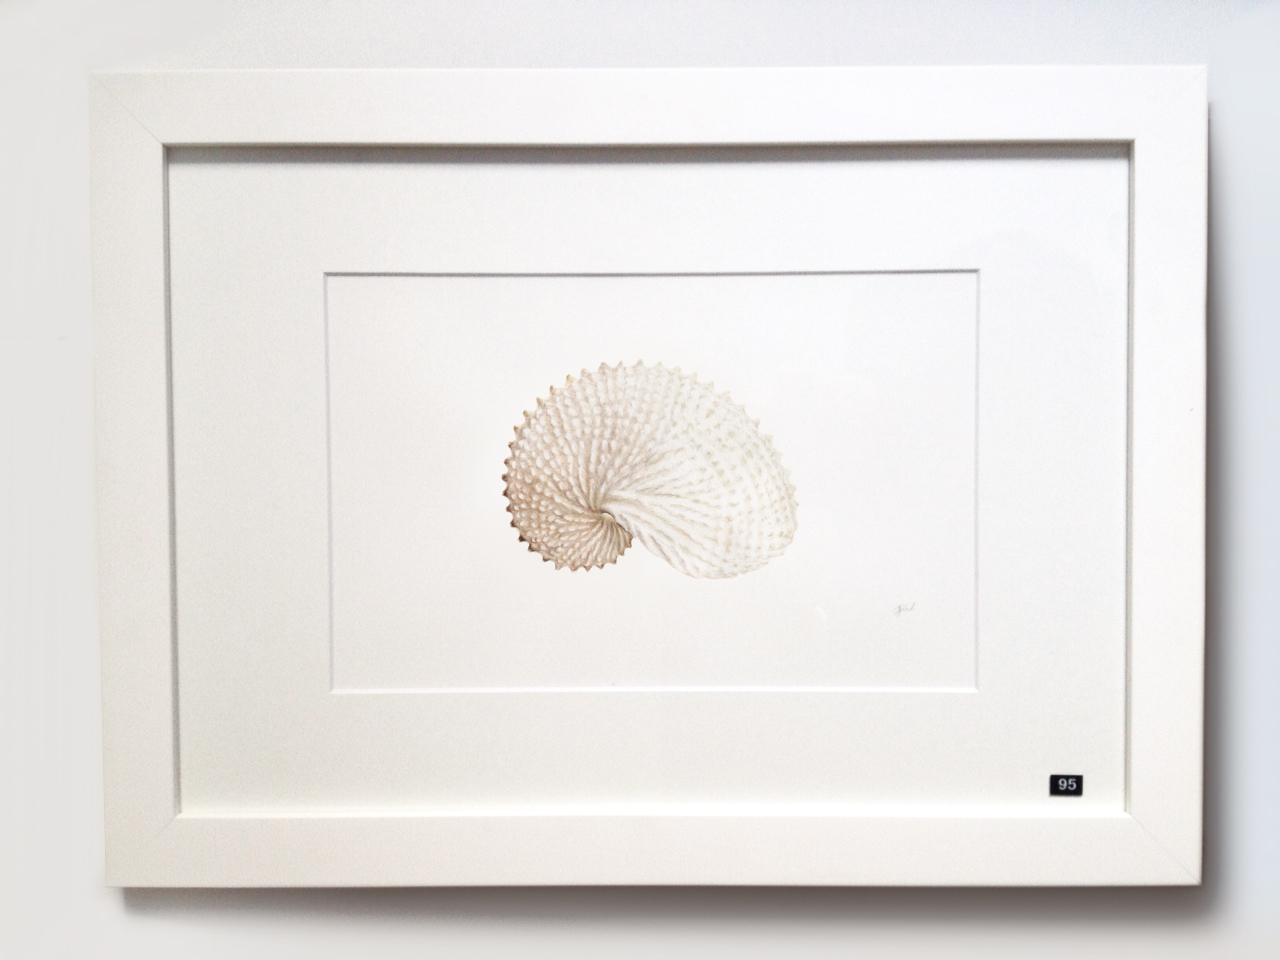 Paper Nautilus (Argonauta nodosa)